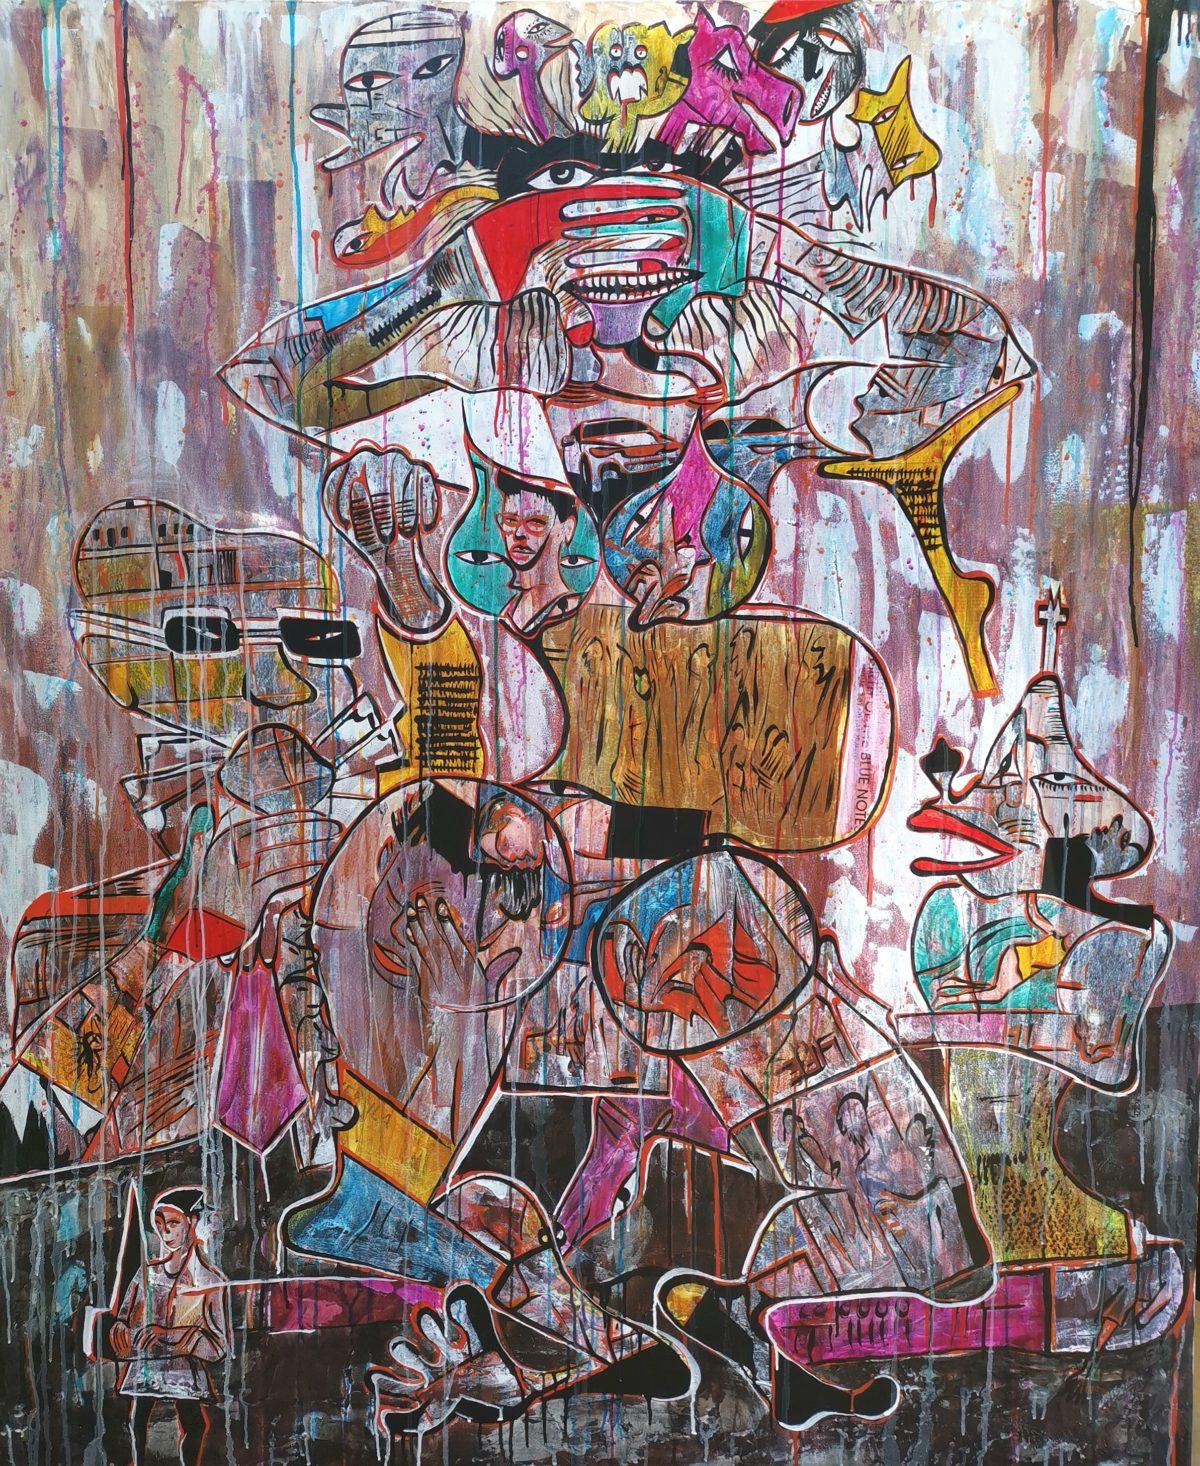 Blessing Ngobeni - Mixed Media and collage on Canvas